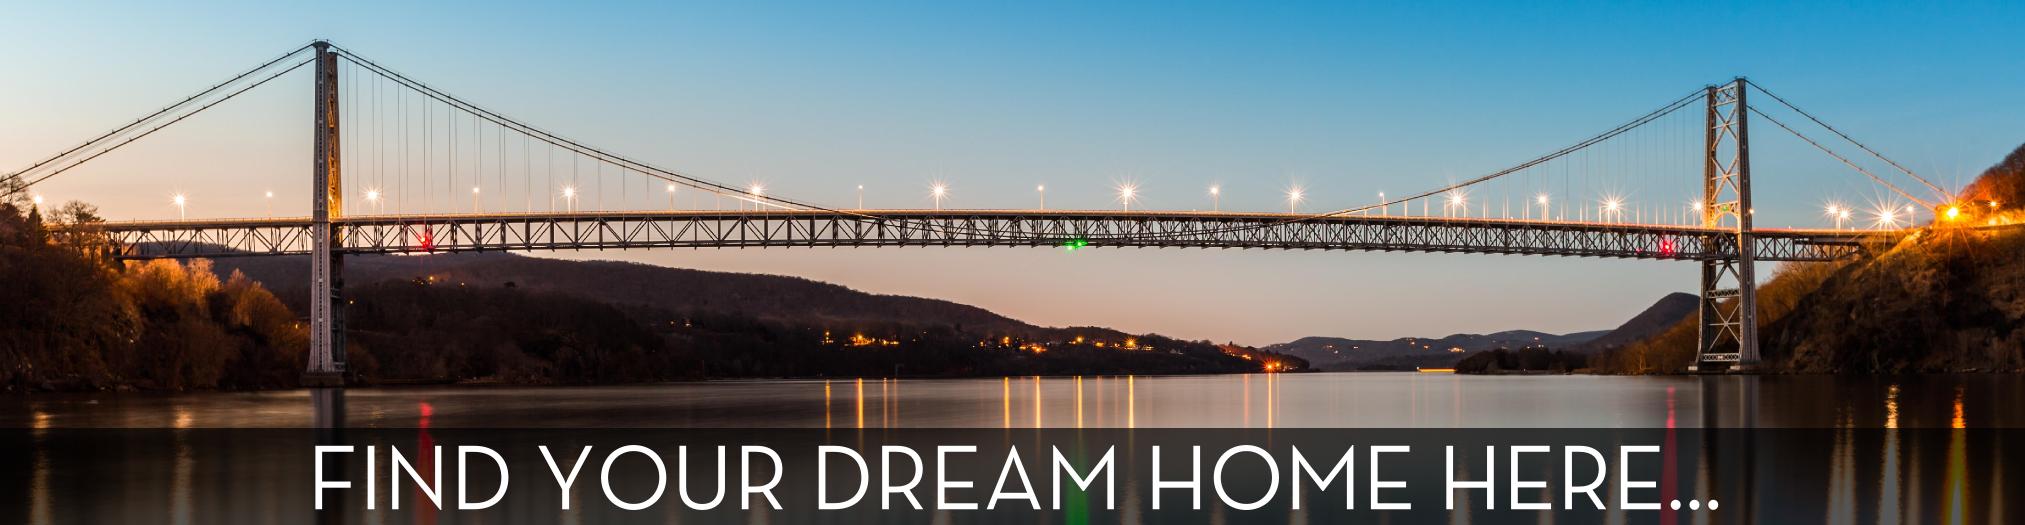 LINDA FERNANDEZ, Keller Williams Realty - Home Search - HUDSON VALLEY  Homes